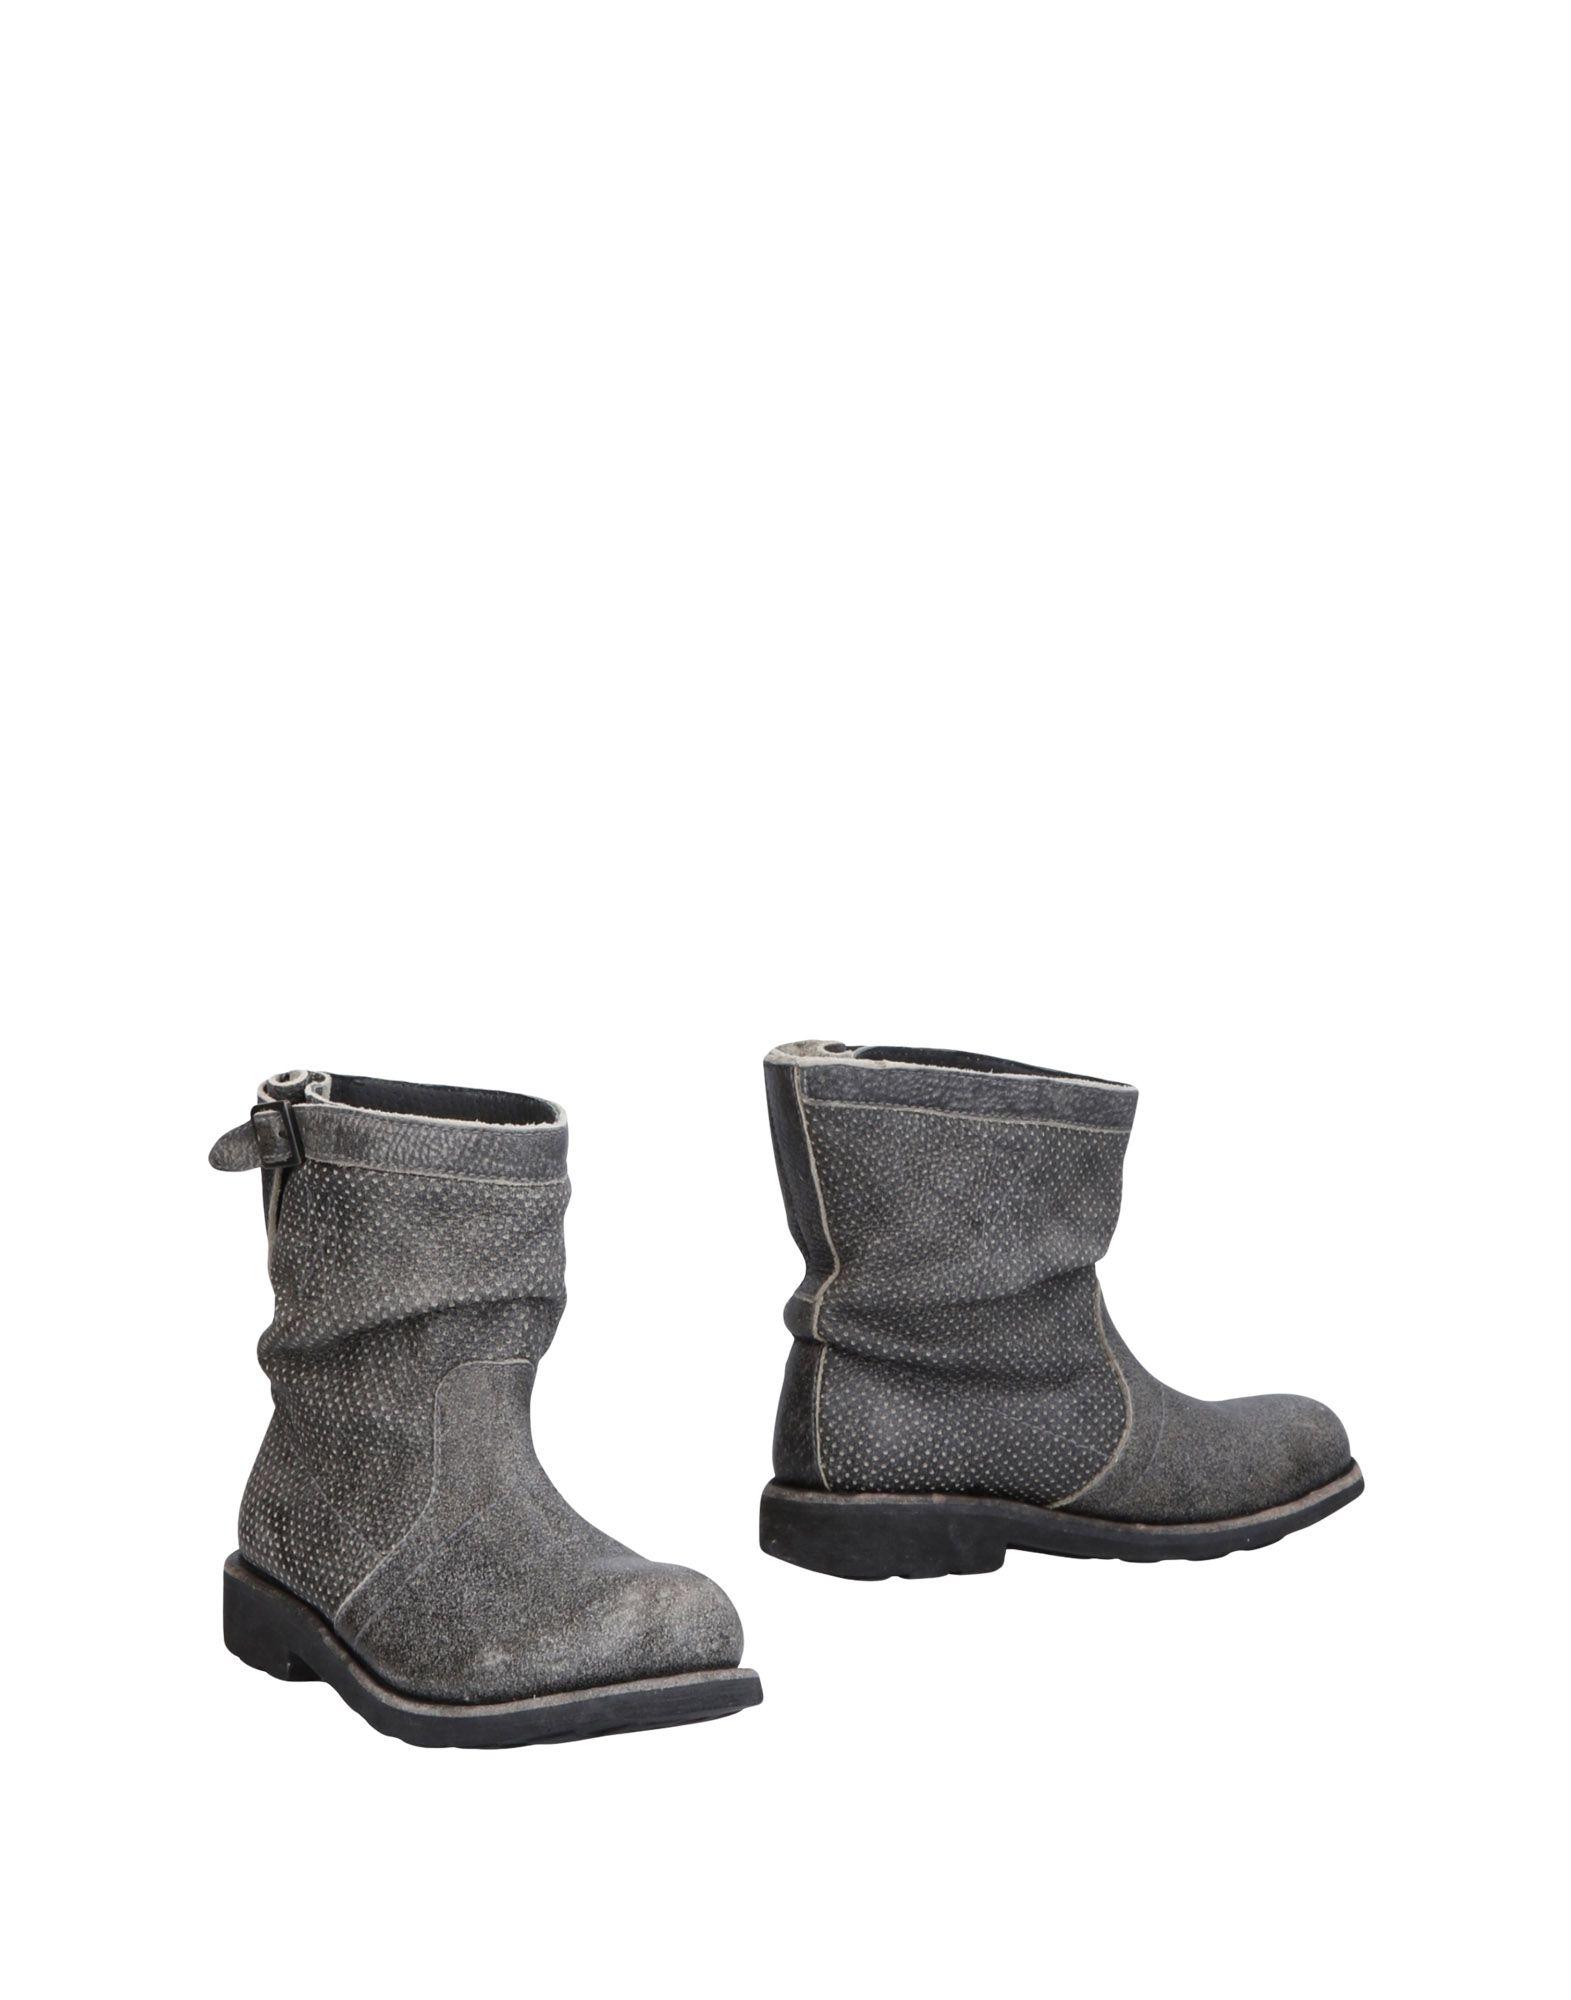 Bikkembergs Ankle Boot - Women Bikkembergs Ankle Ankle Bikkembergs Boots online on  United Kingdom - 11464712IB f1310c